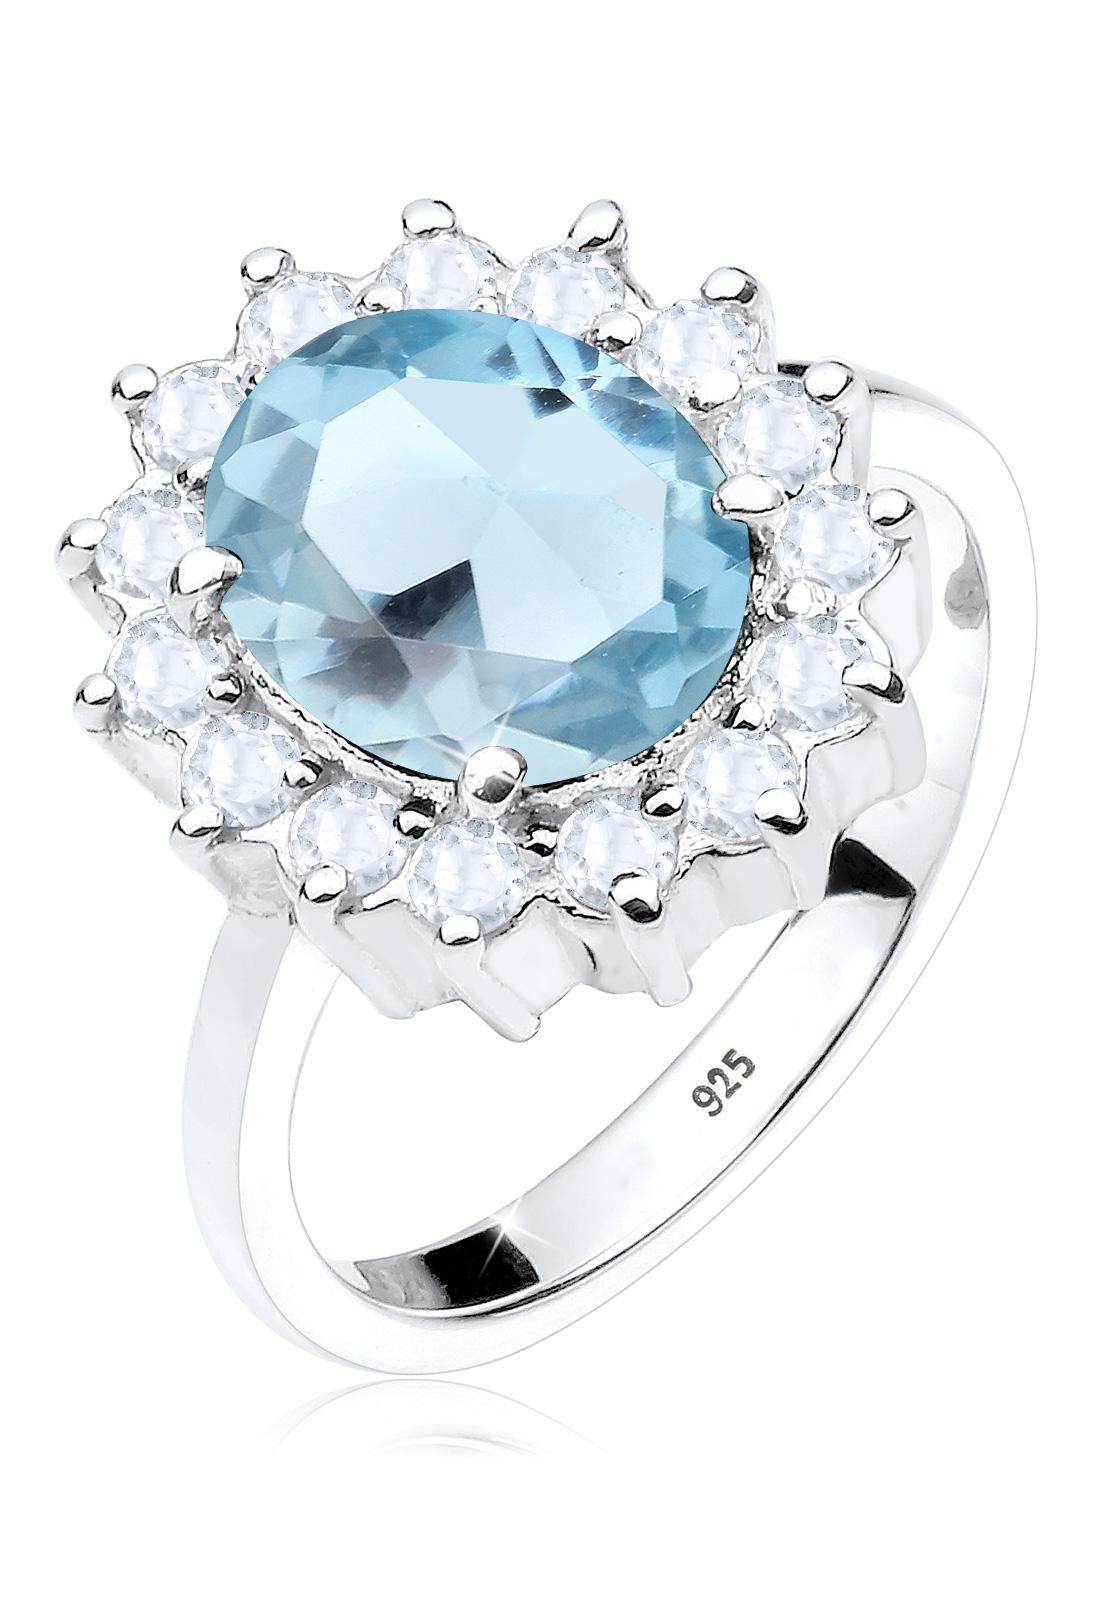 Elli Germany 925 Sterling Silver Cincin Glamour Blue Topaz Biru Muda